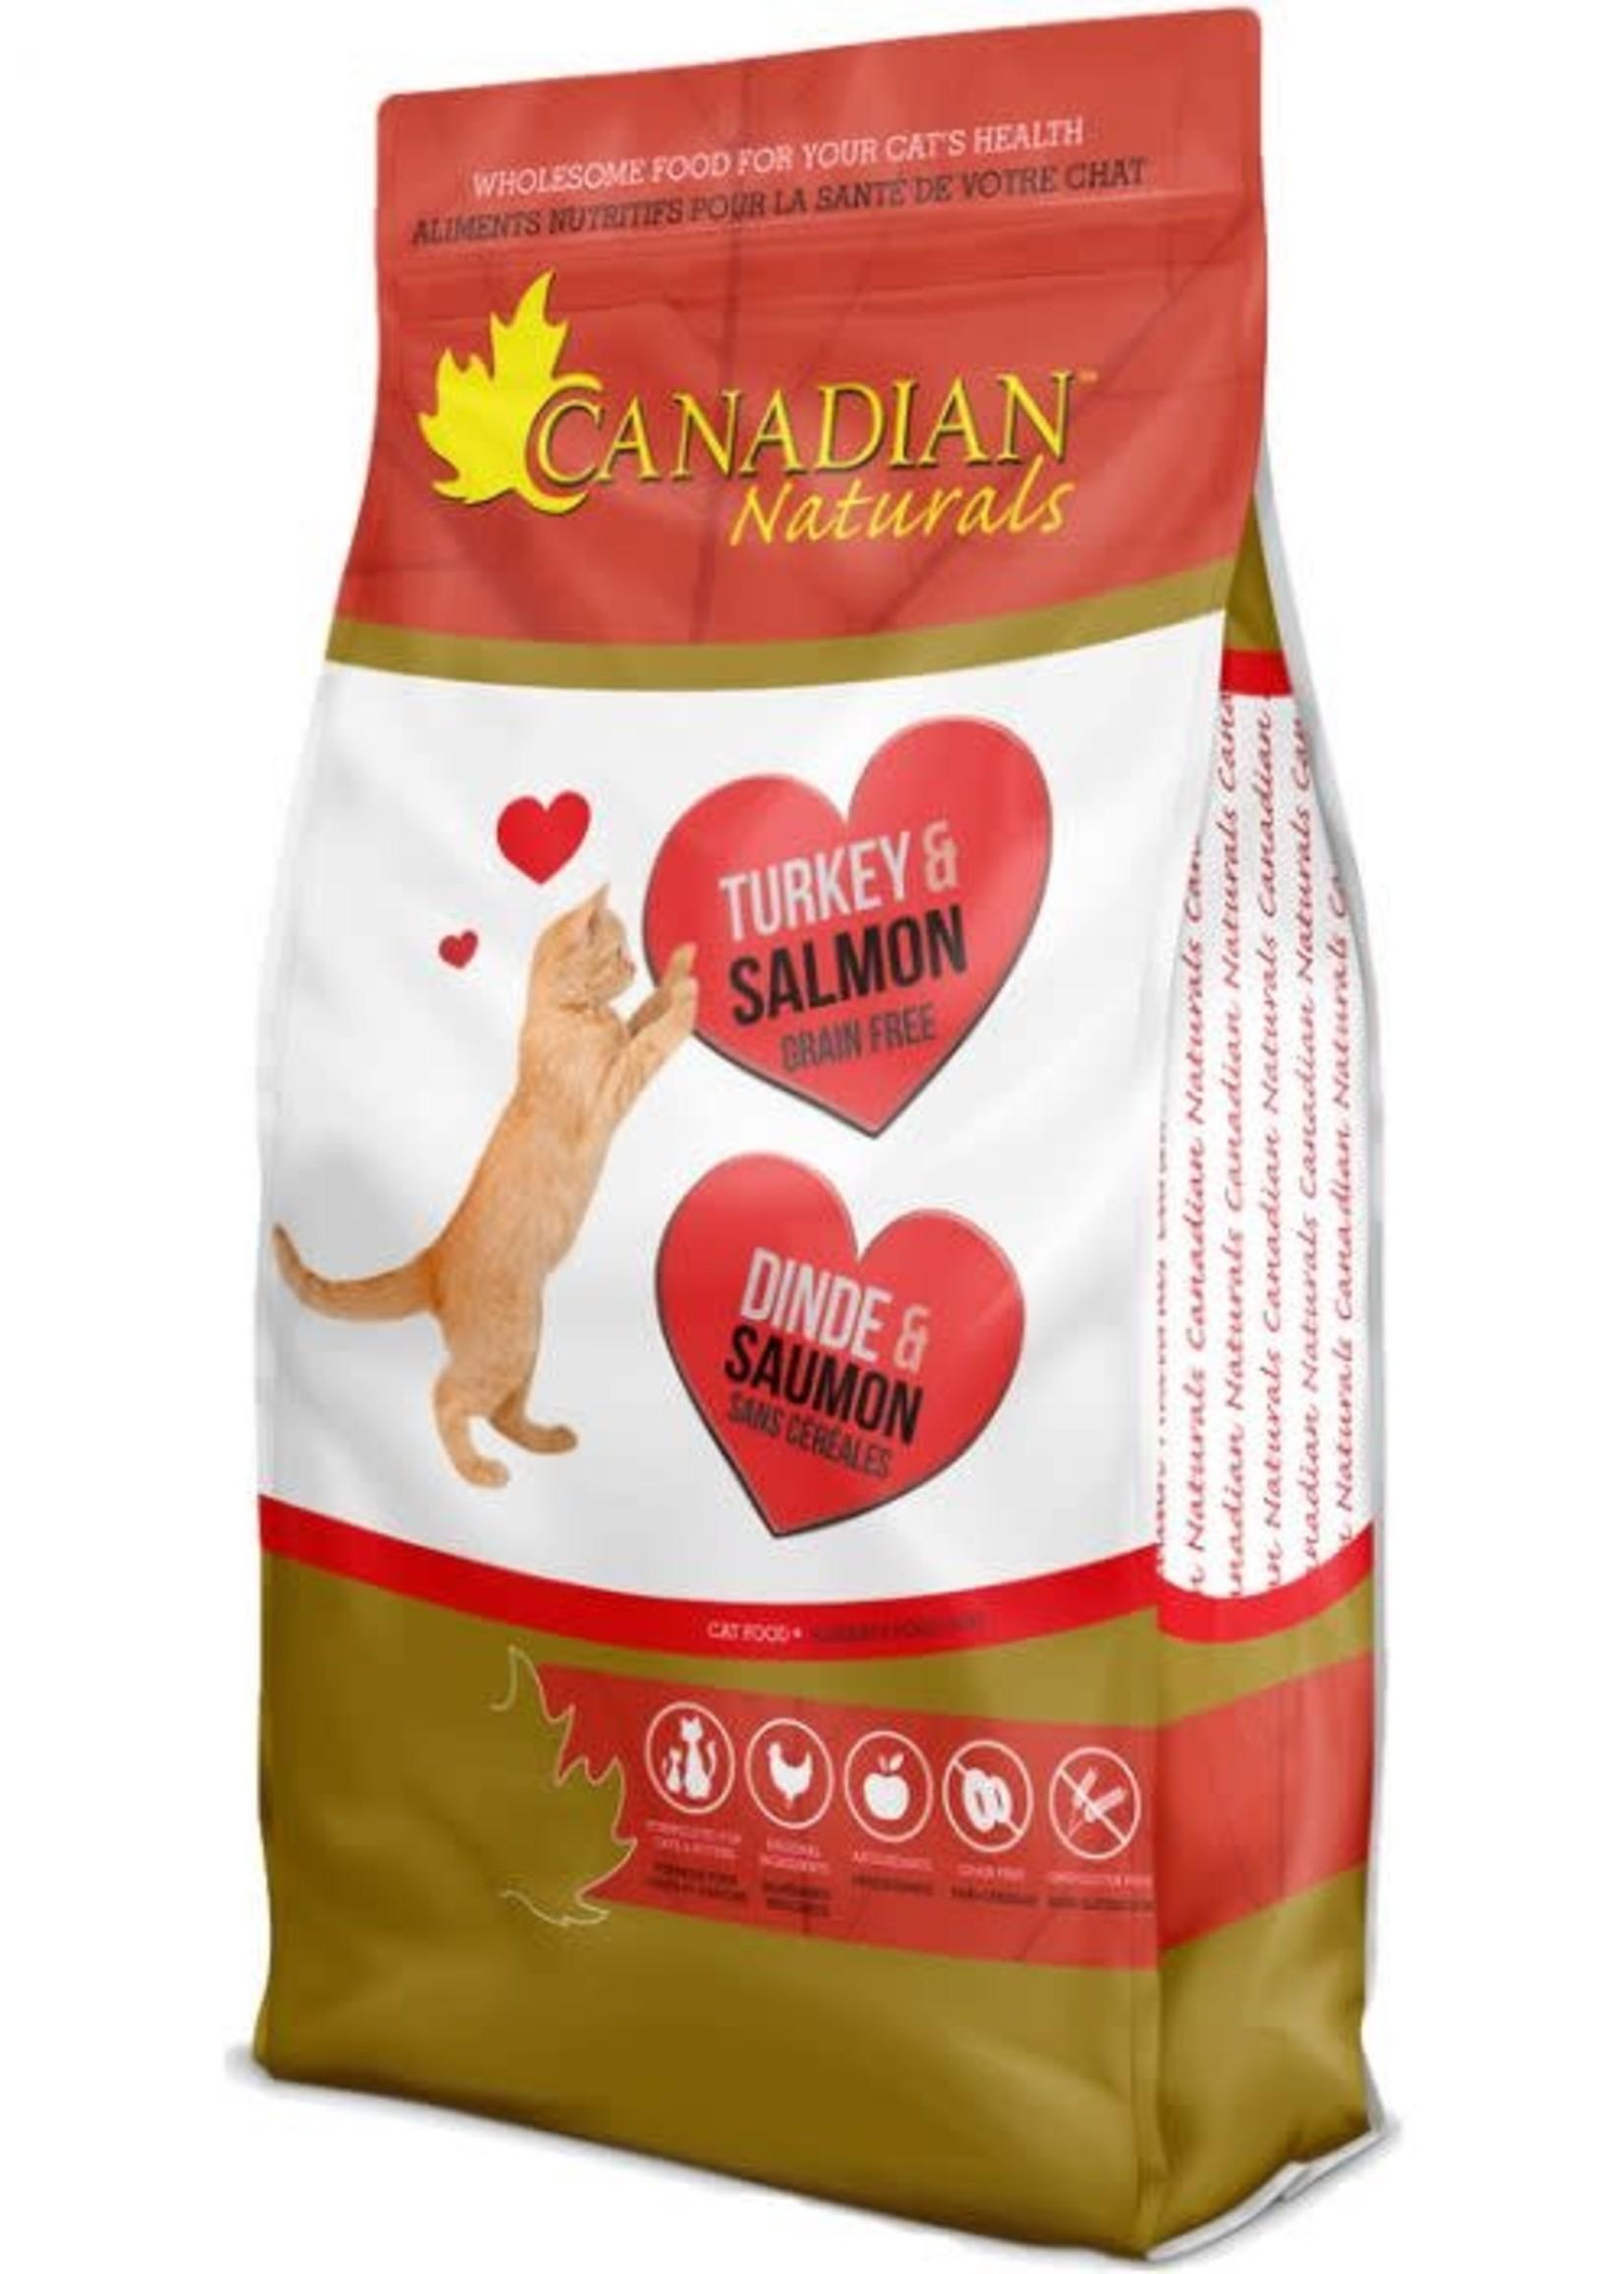 Canadian Naturals® CANADIAN NATURALS GRAIN FREE TURKEY & SALMON 3lbs